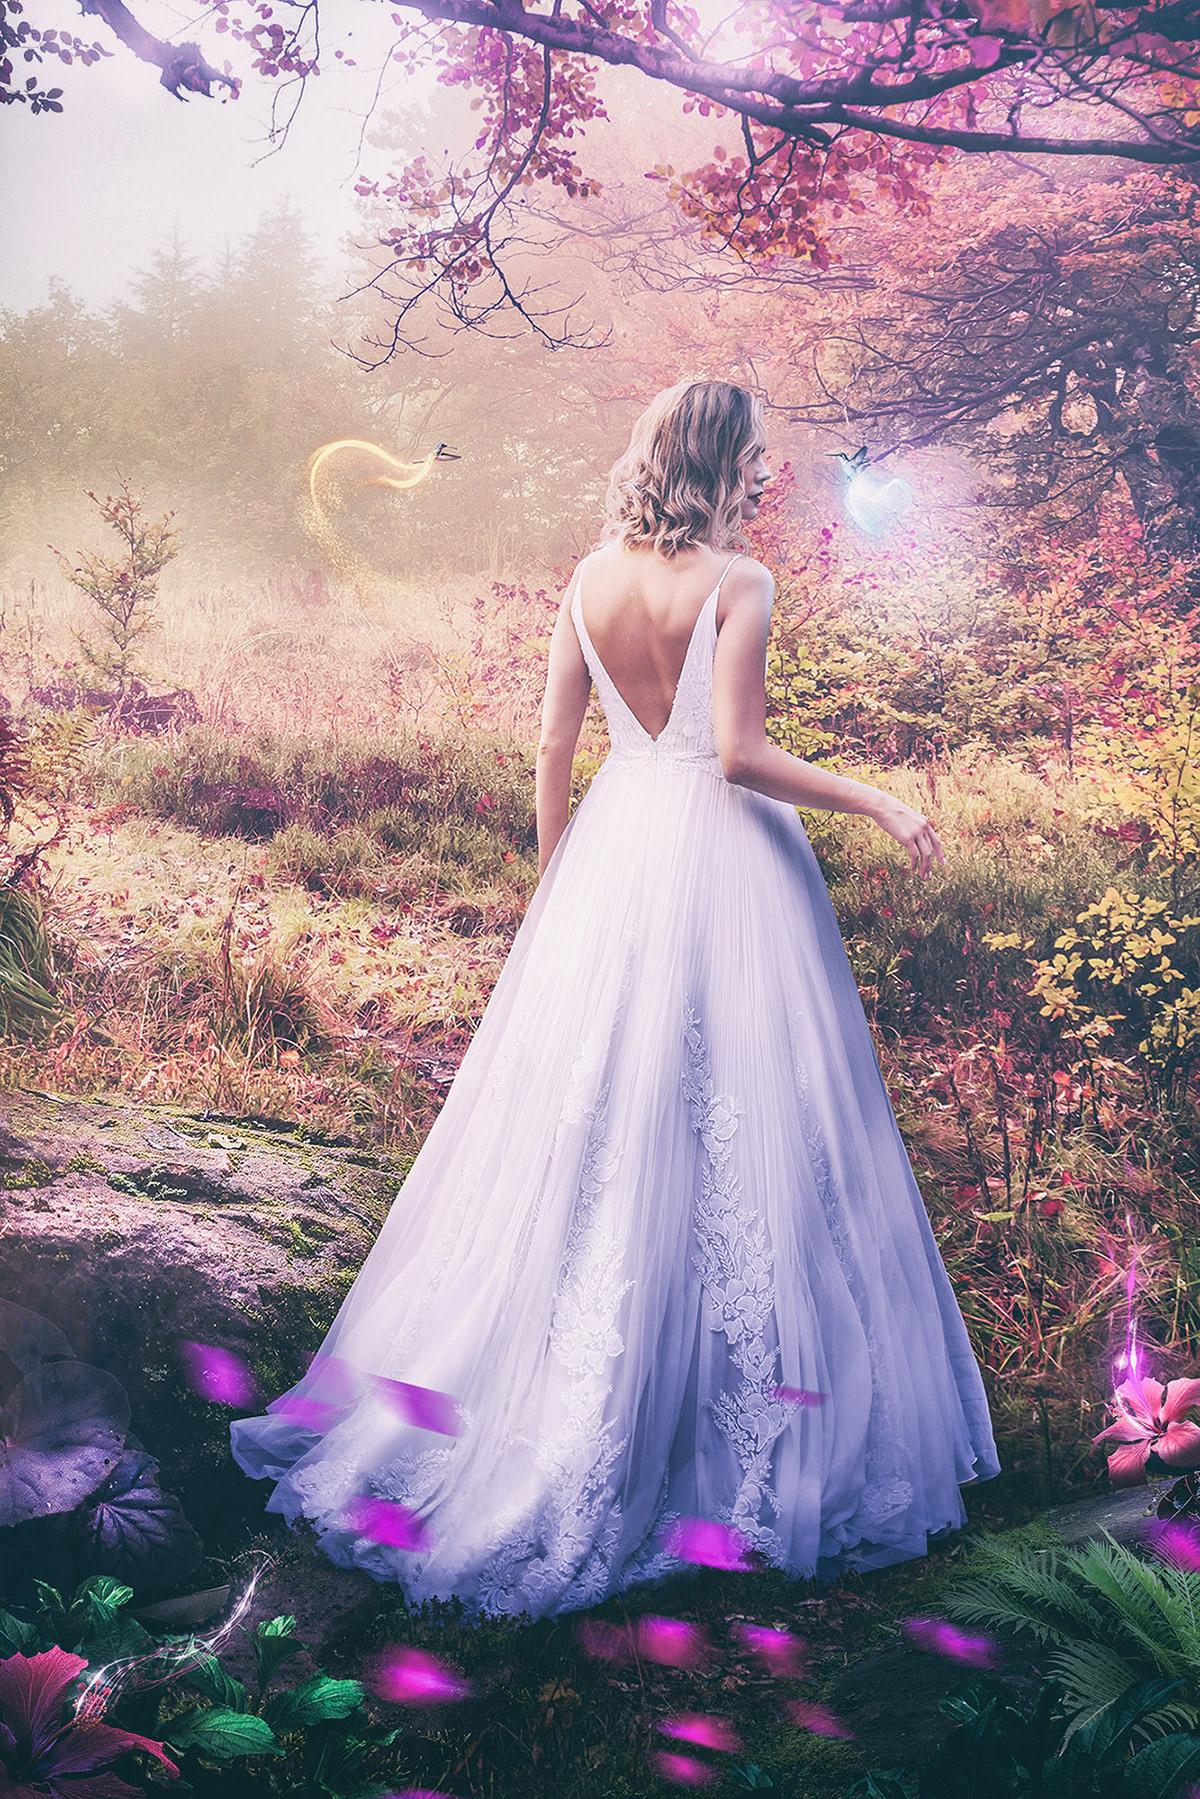 Narin Moda Bridal dress